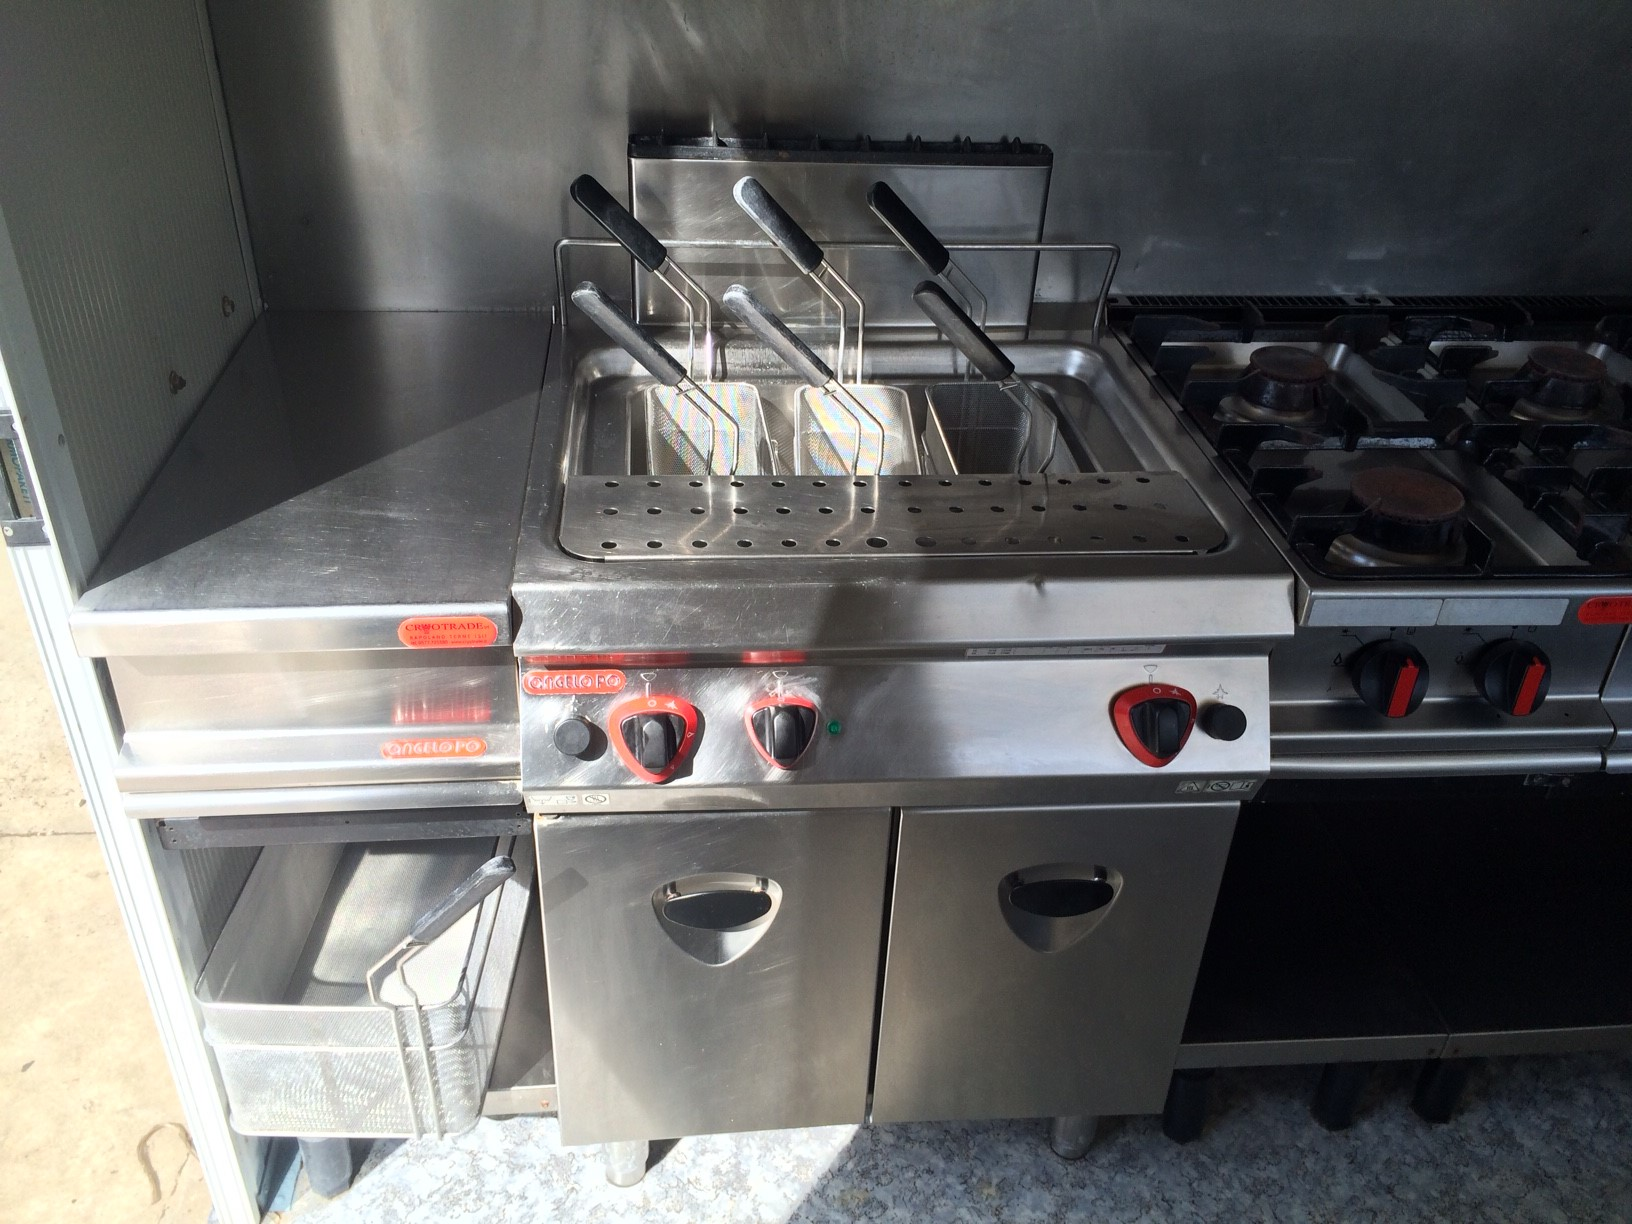 Noleggio cucina attrezzata cryo trade - Motori per cappe da cucina ...